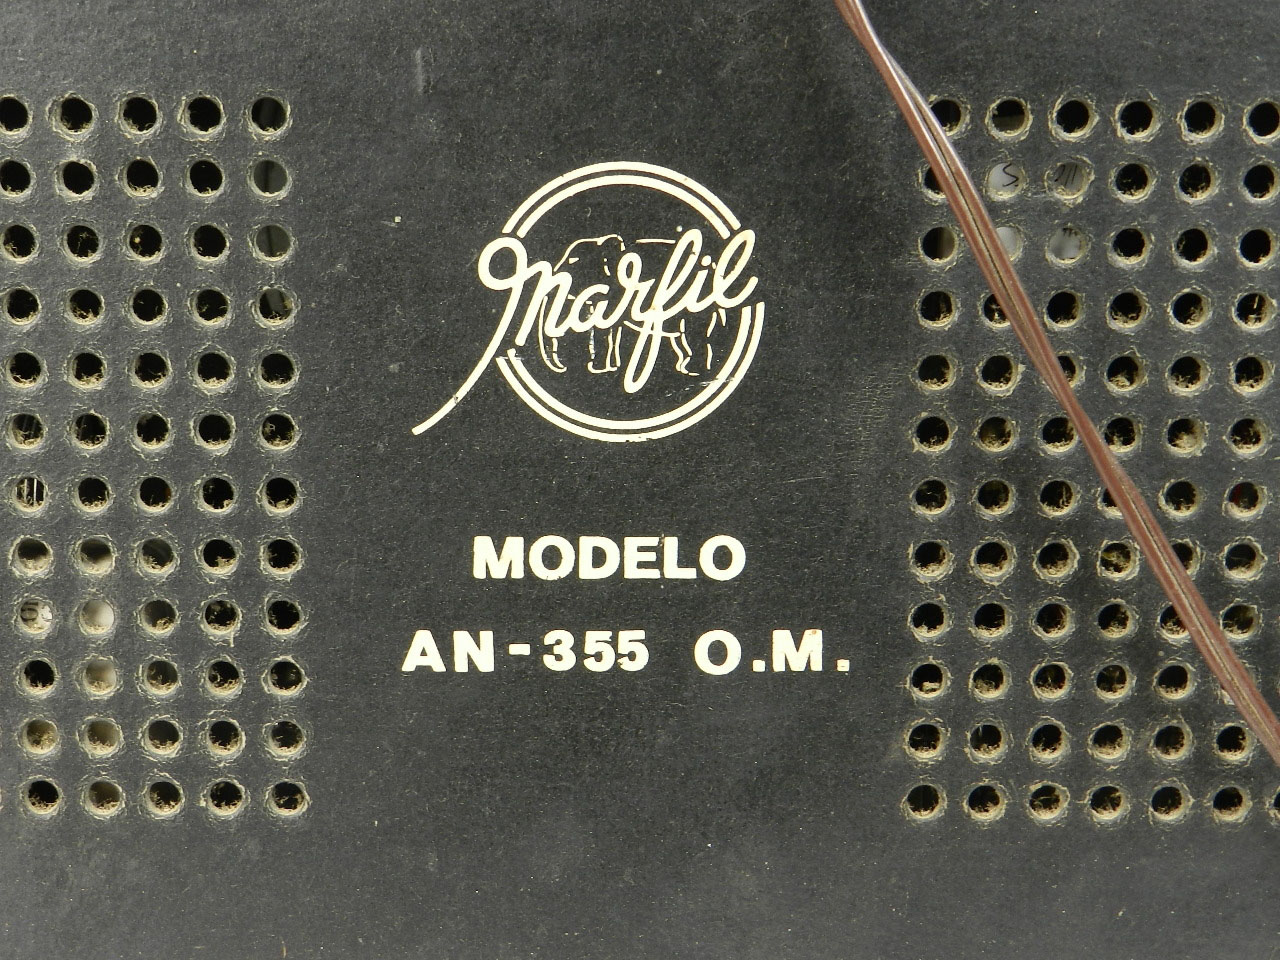 Imagen RADIO MARFIL AN-355 O.M  AÑO 1950 25925